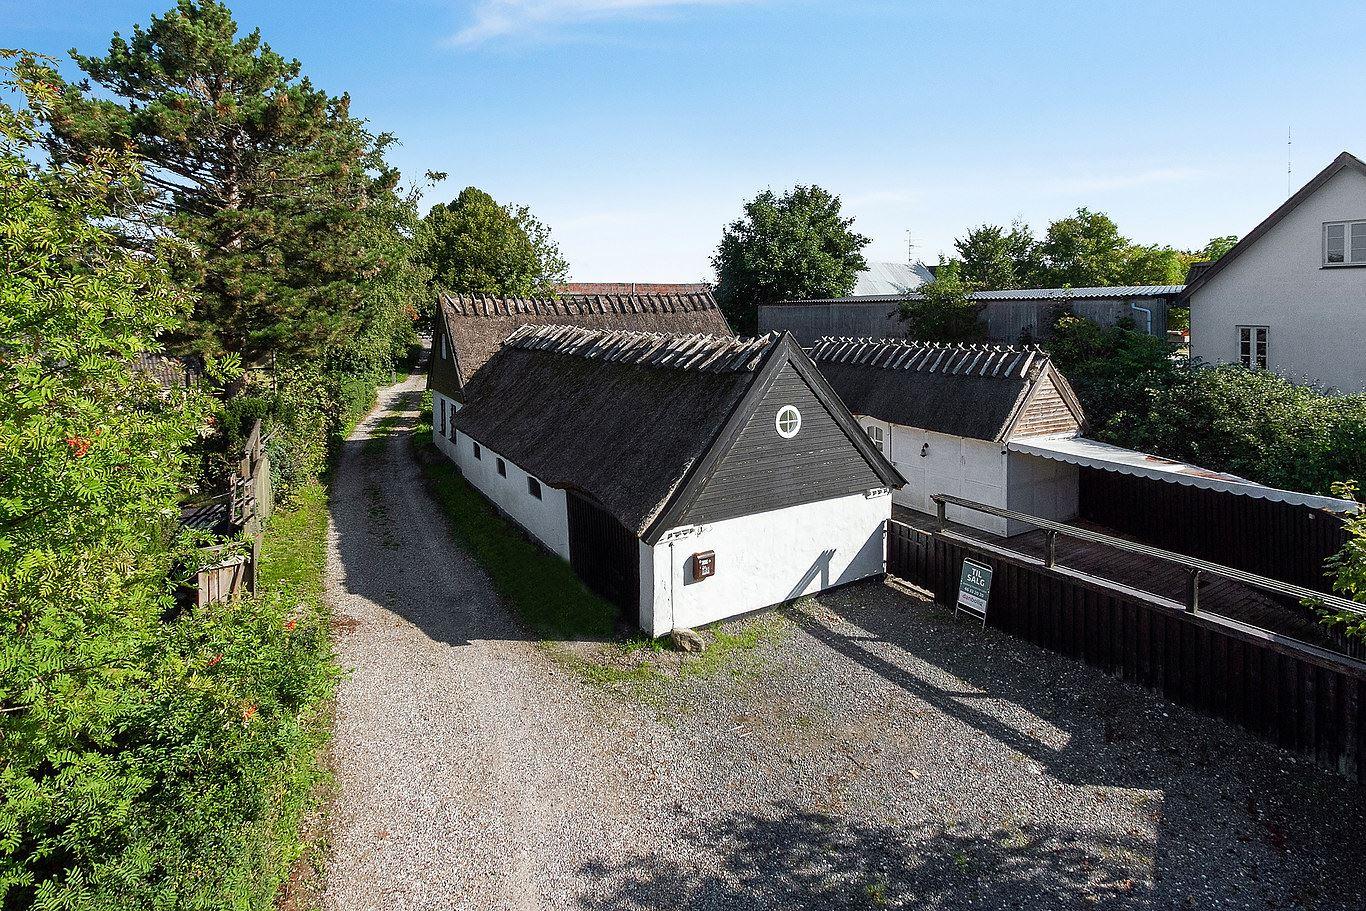 Korskær 3, Herringløse, 4000 Roskilde